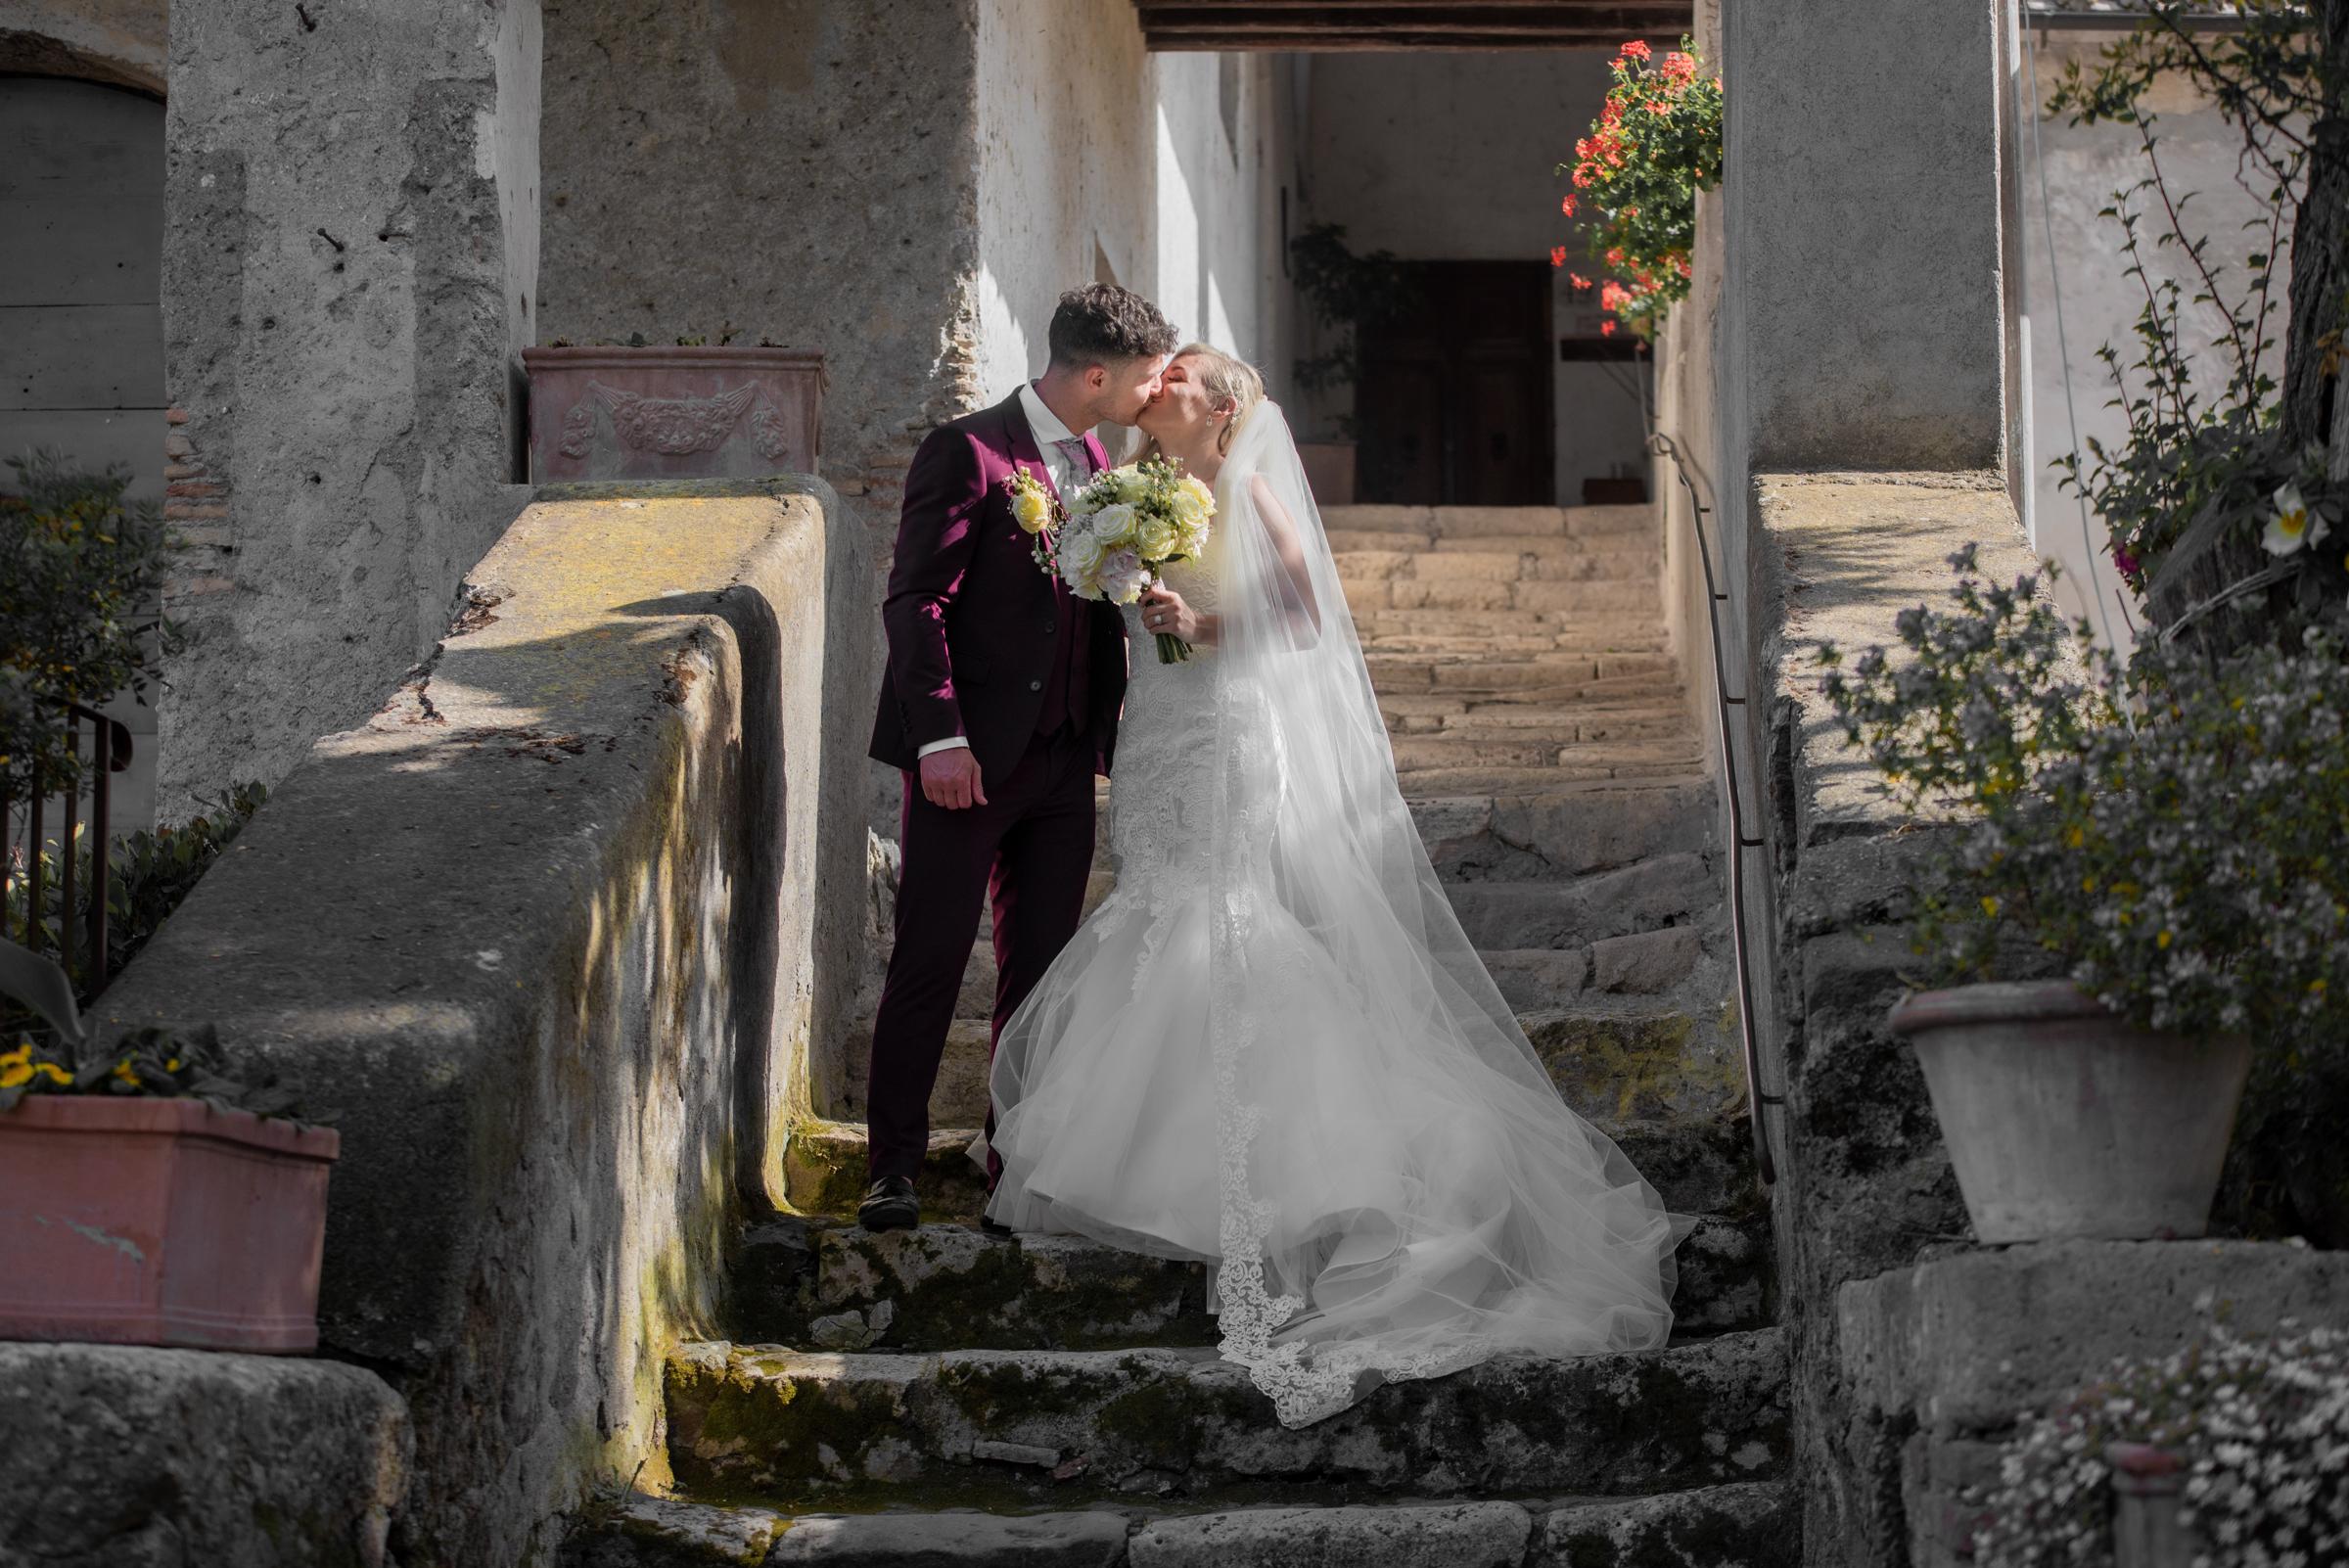 Borgo di tragliata Wedding-27.jpg